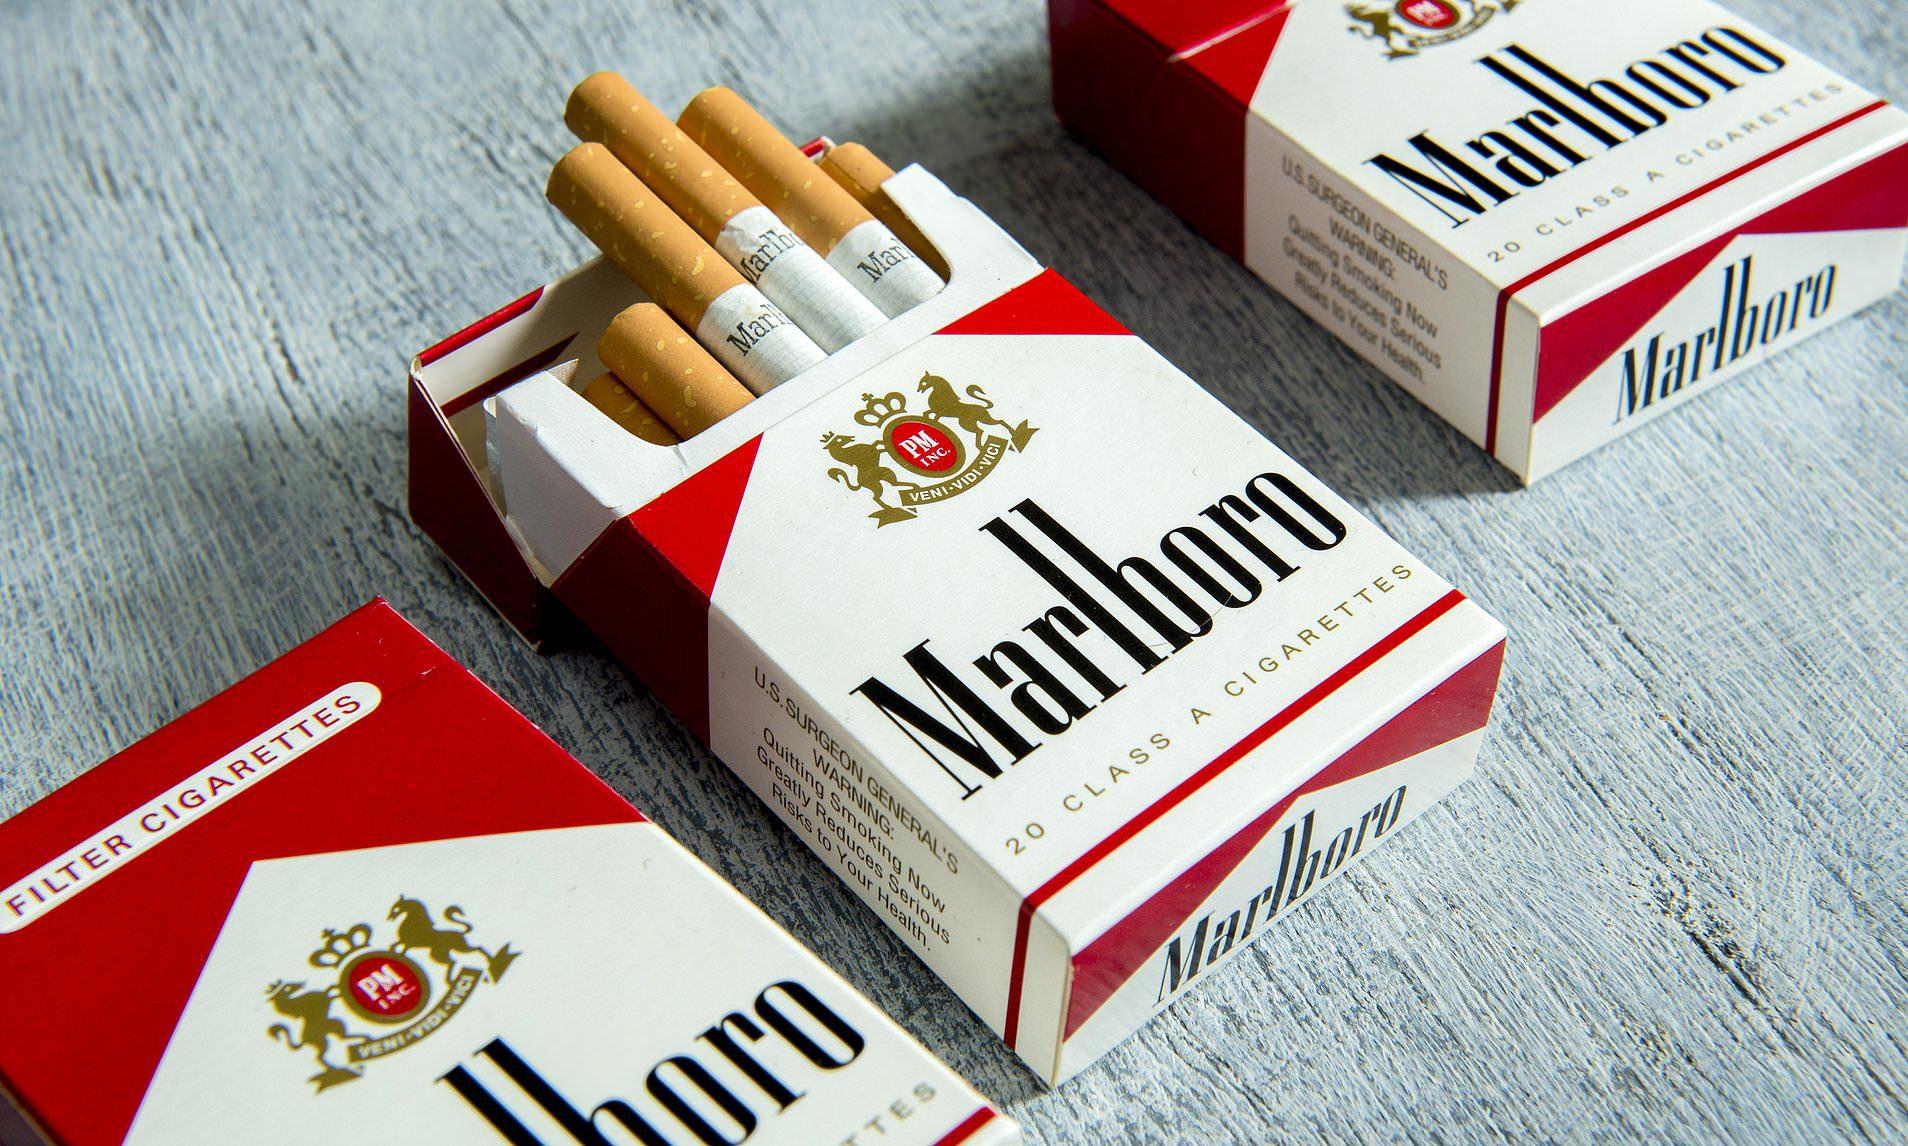 Marlboro Maker Philip Morris Buys 22.61 Per Cent Stake In British Respiratory Drug Developer Vectura